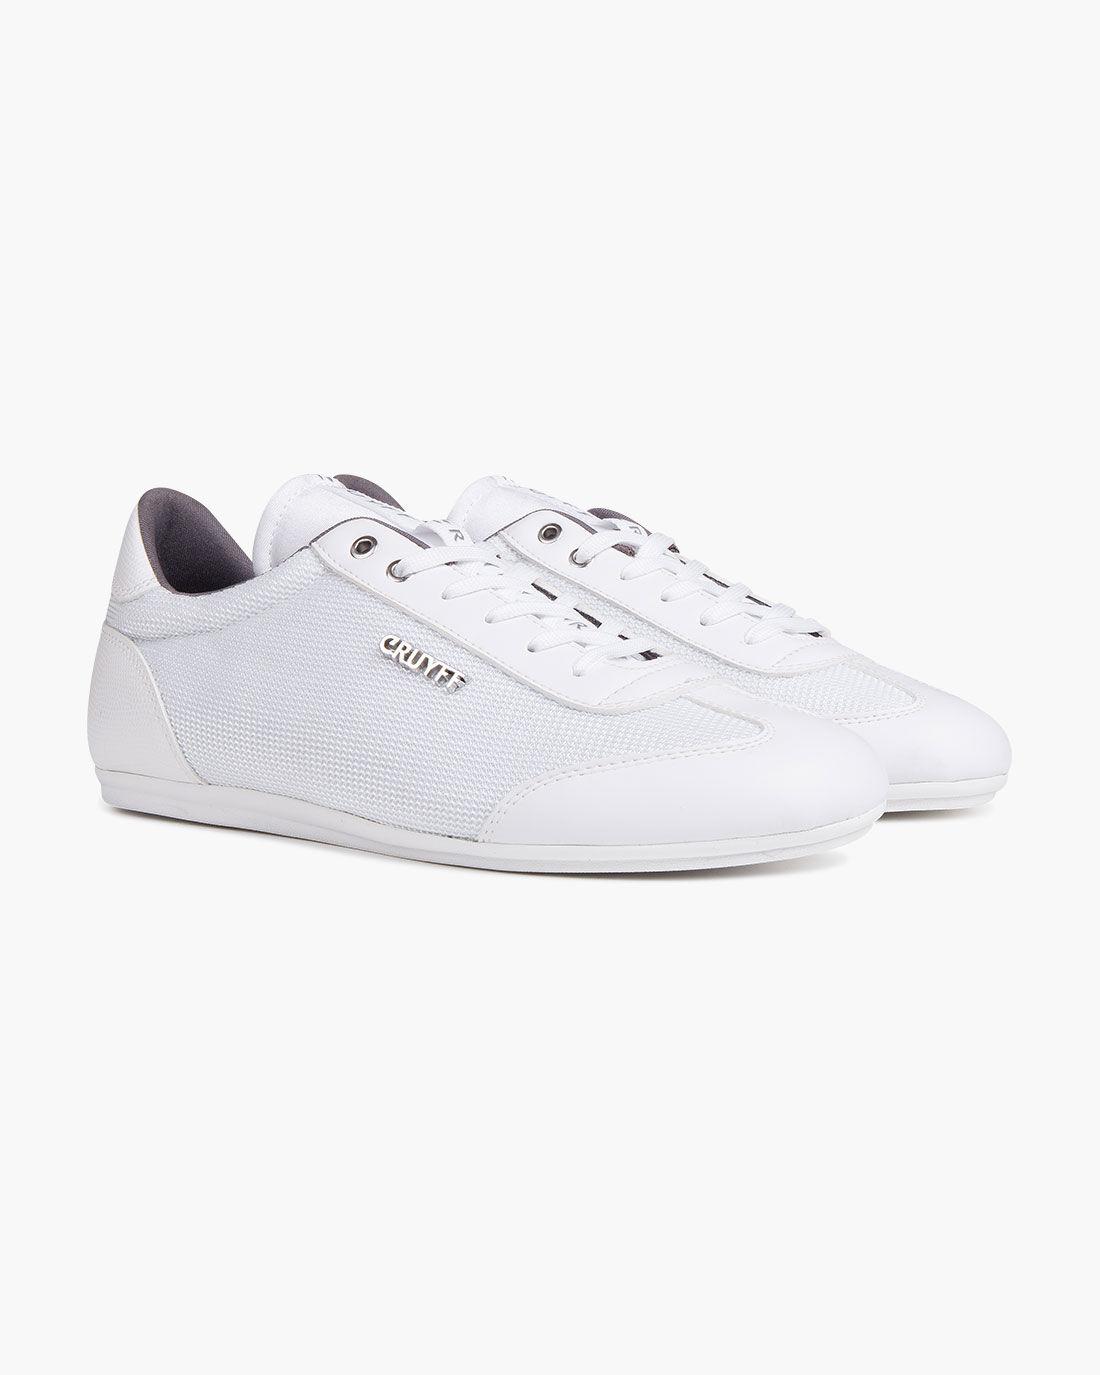 Shop Recopa | Official Cruyff Webshop